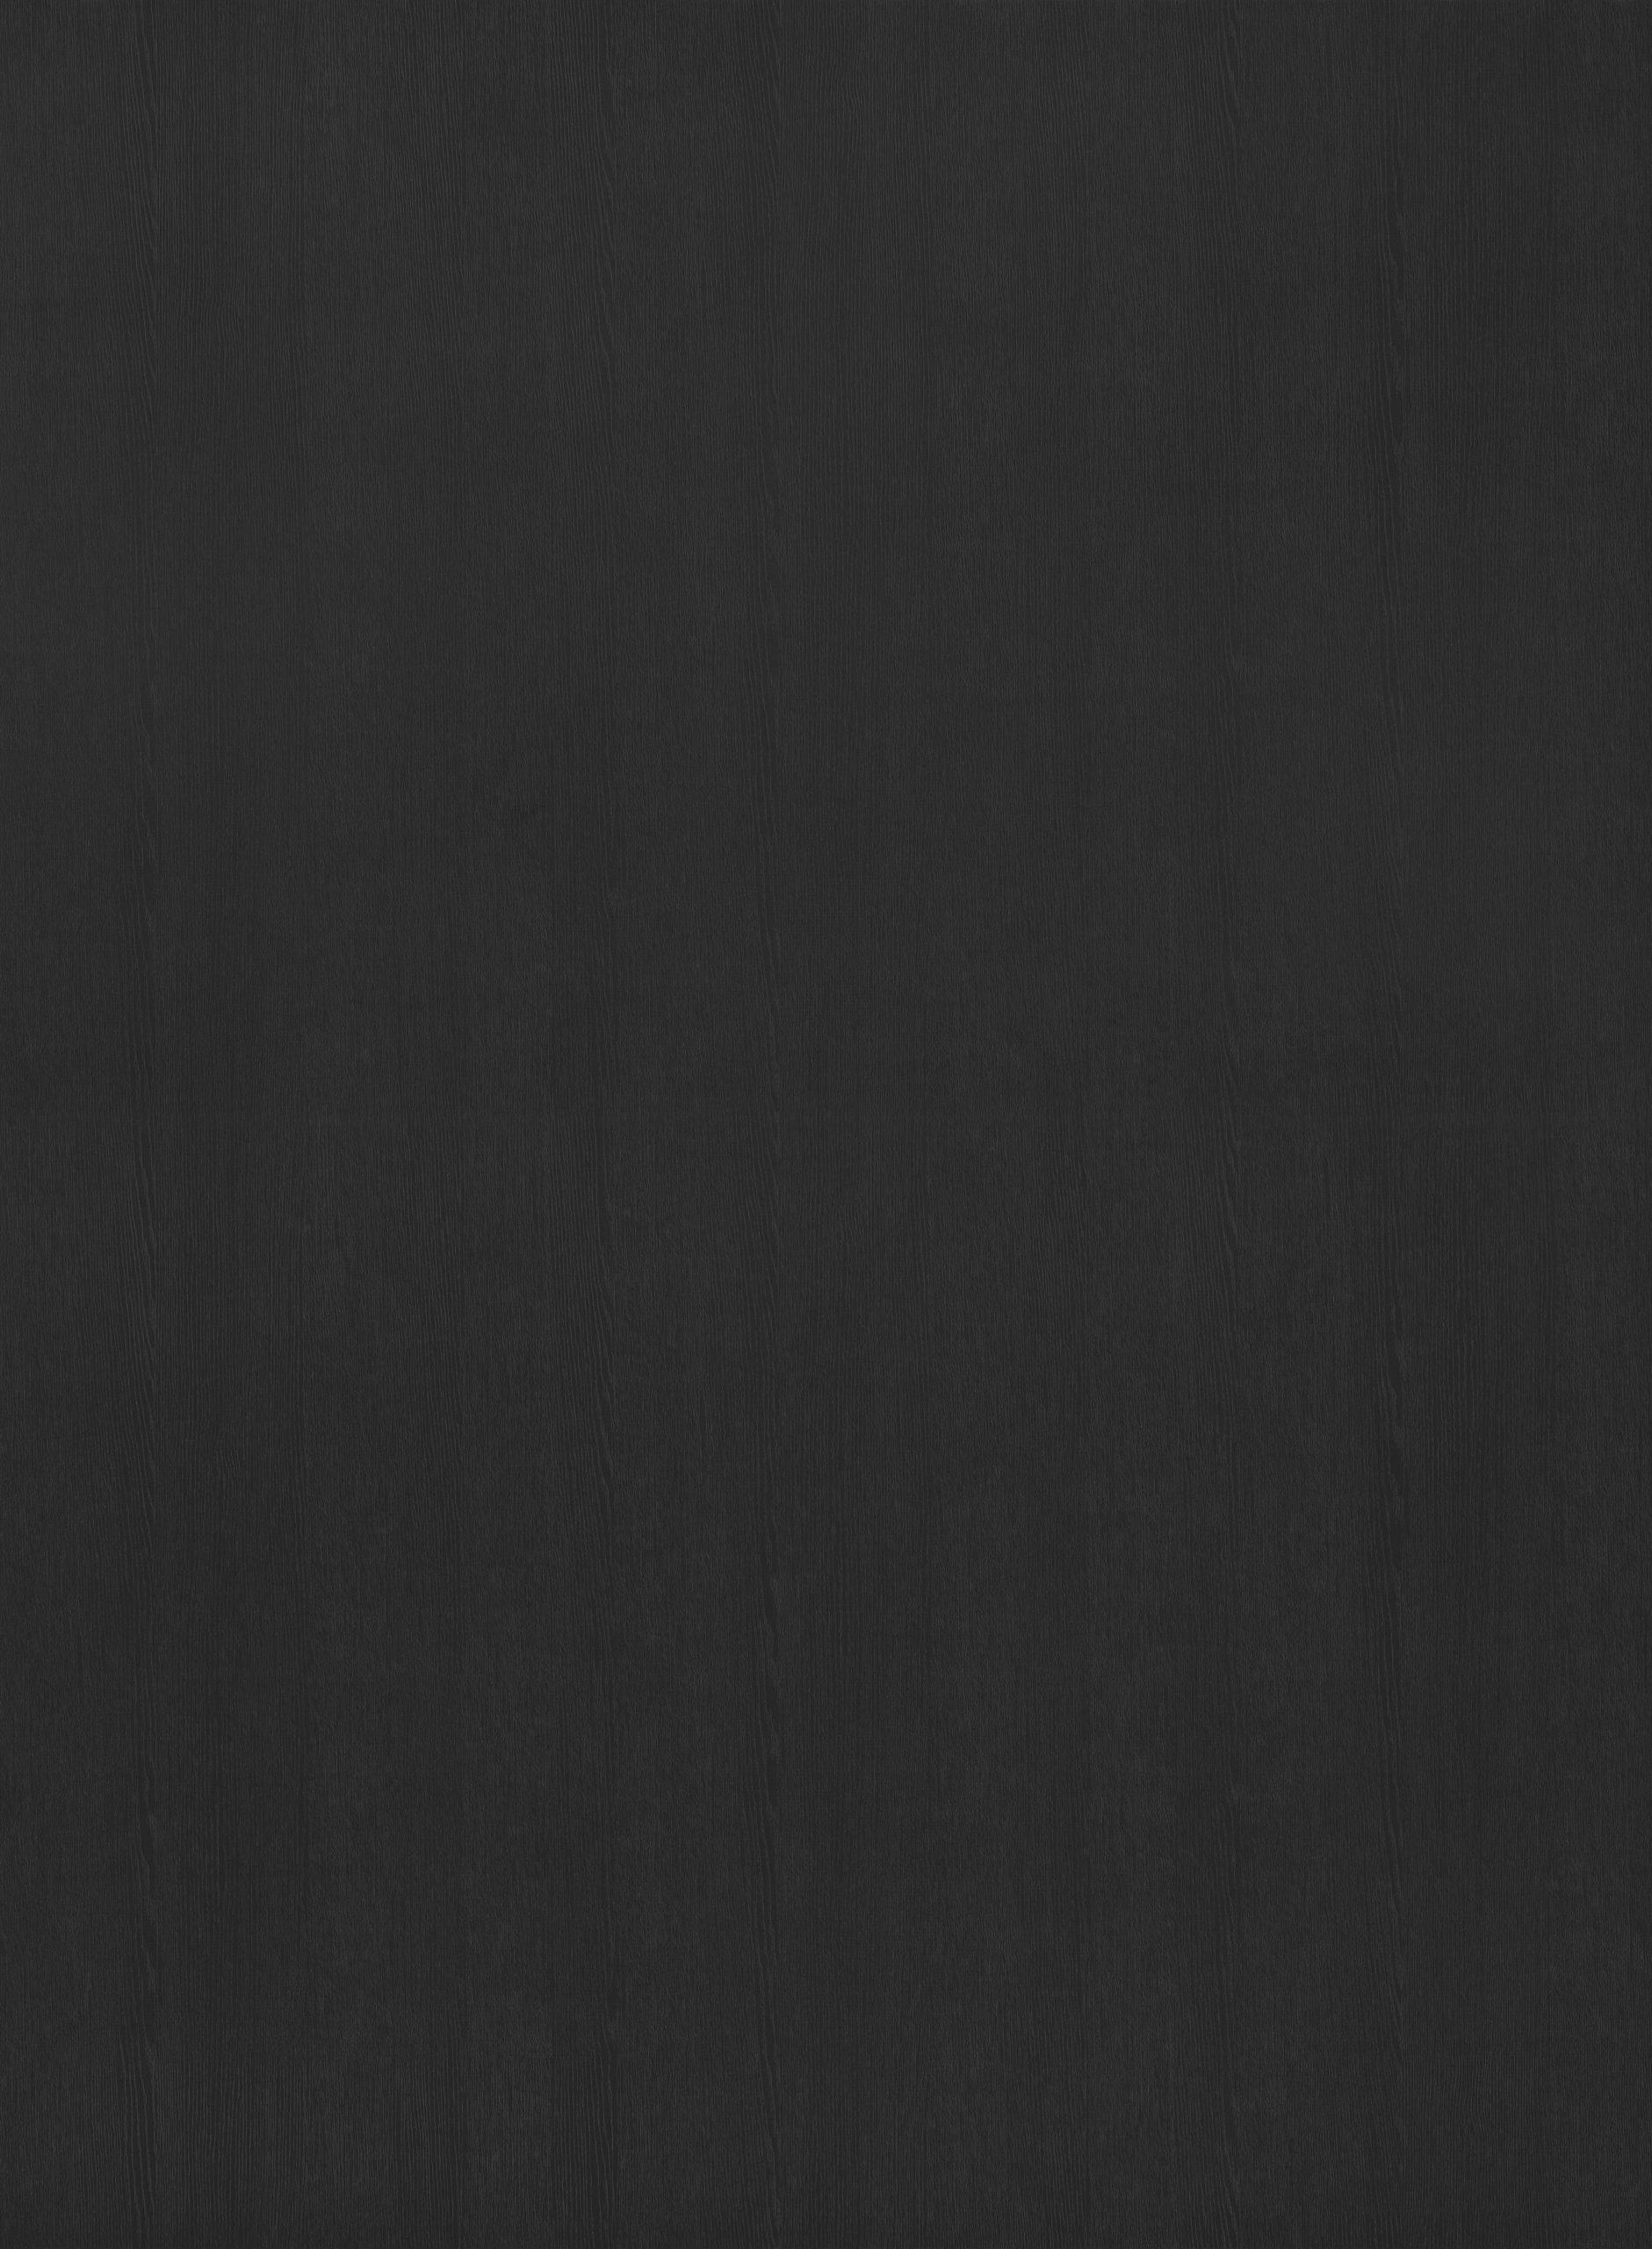 DecoLegno U129 Spessart hele plaat afb. 2800x2070mm/Tekenprogramma